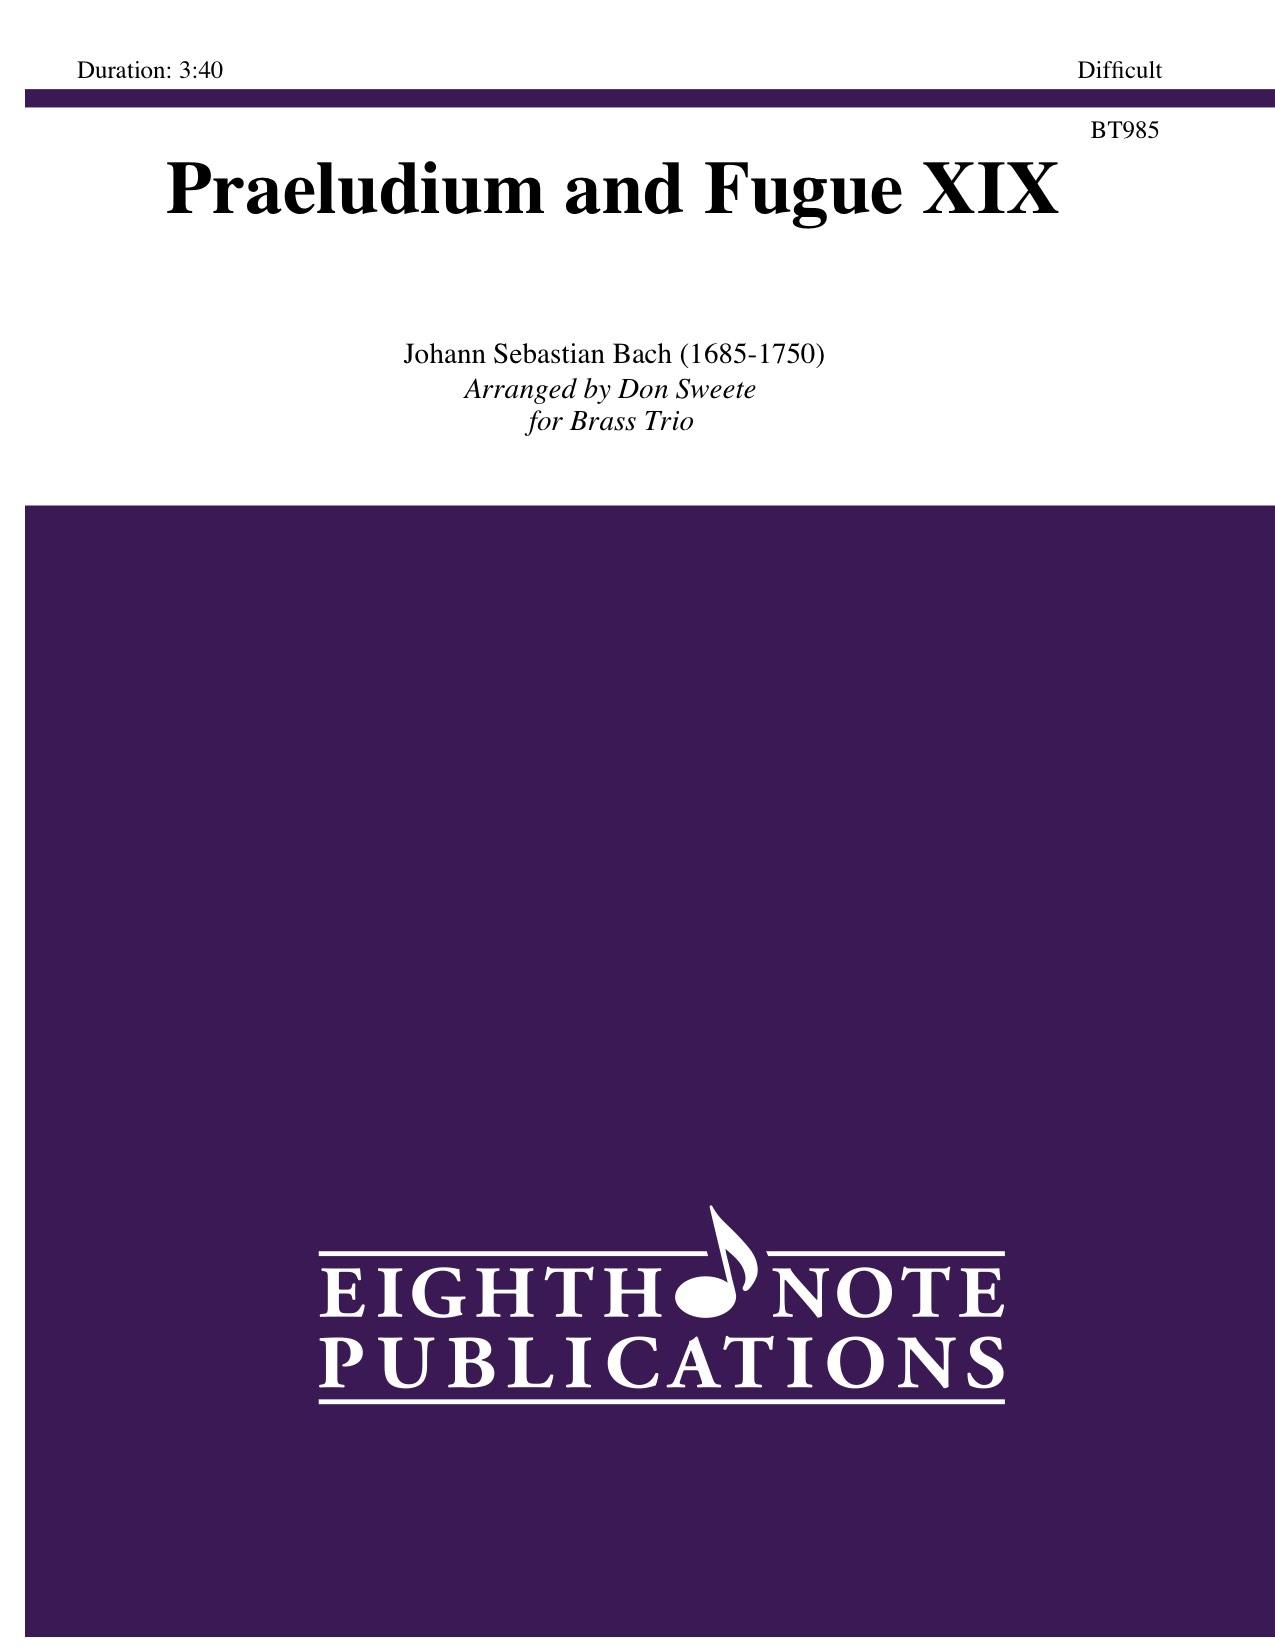 Praeludium and Fugue XIX - Johann Sebastian Bach